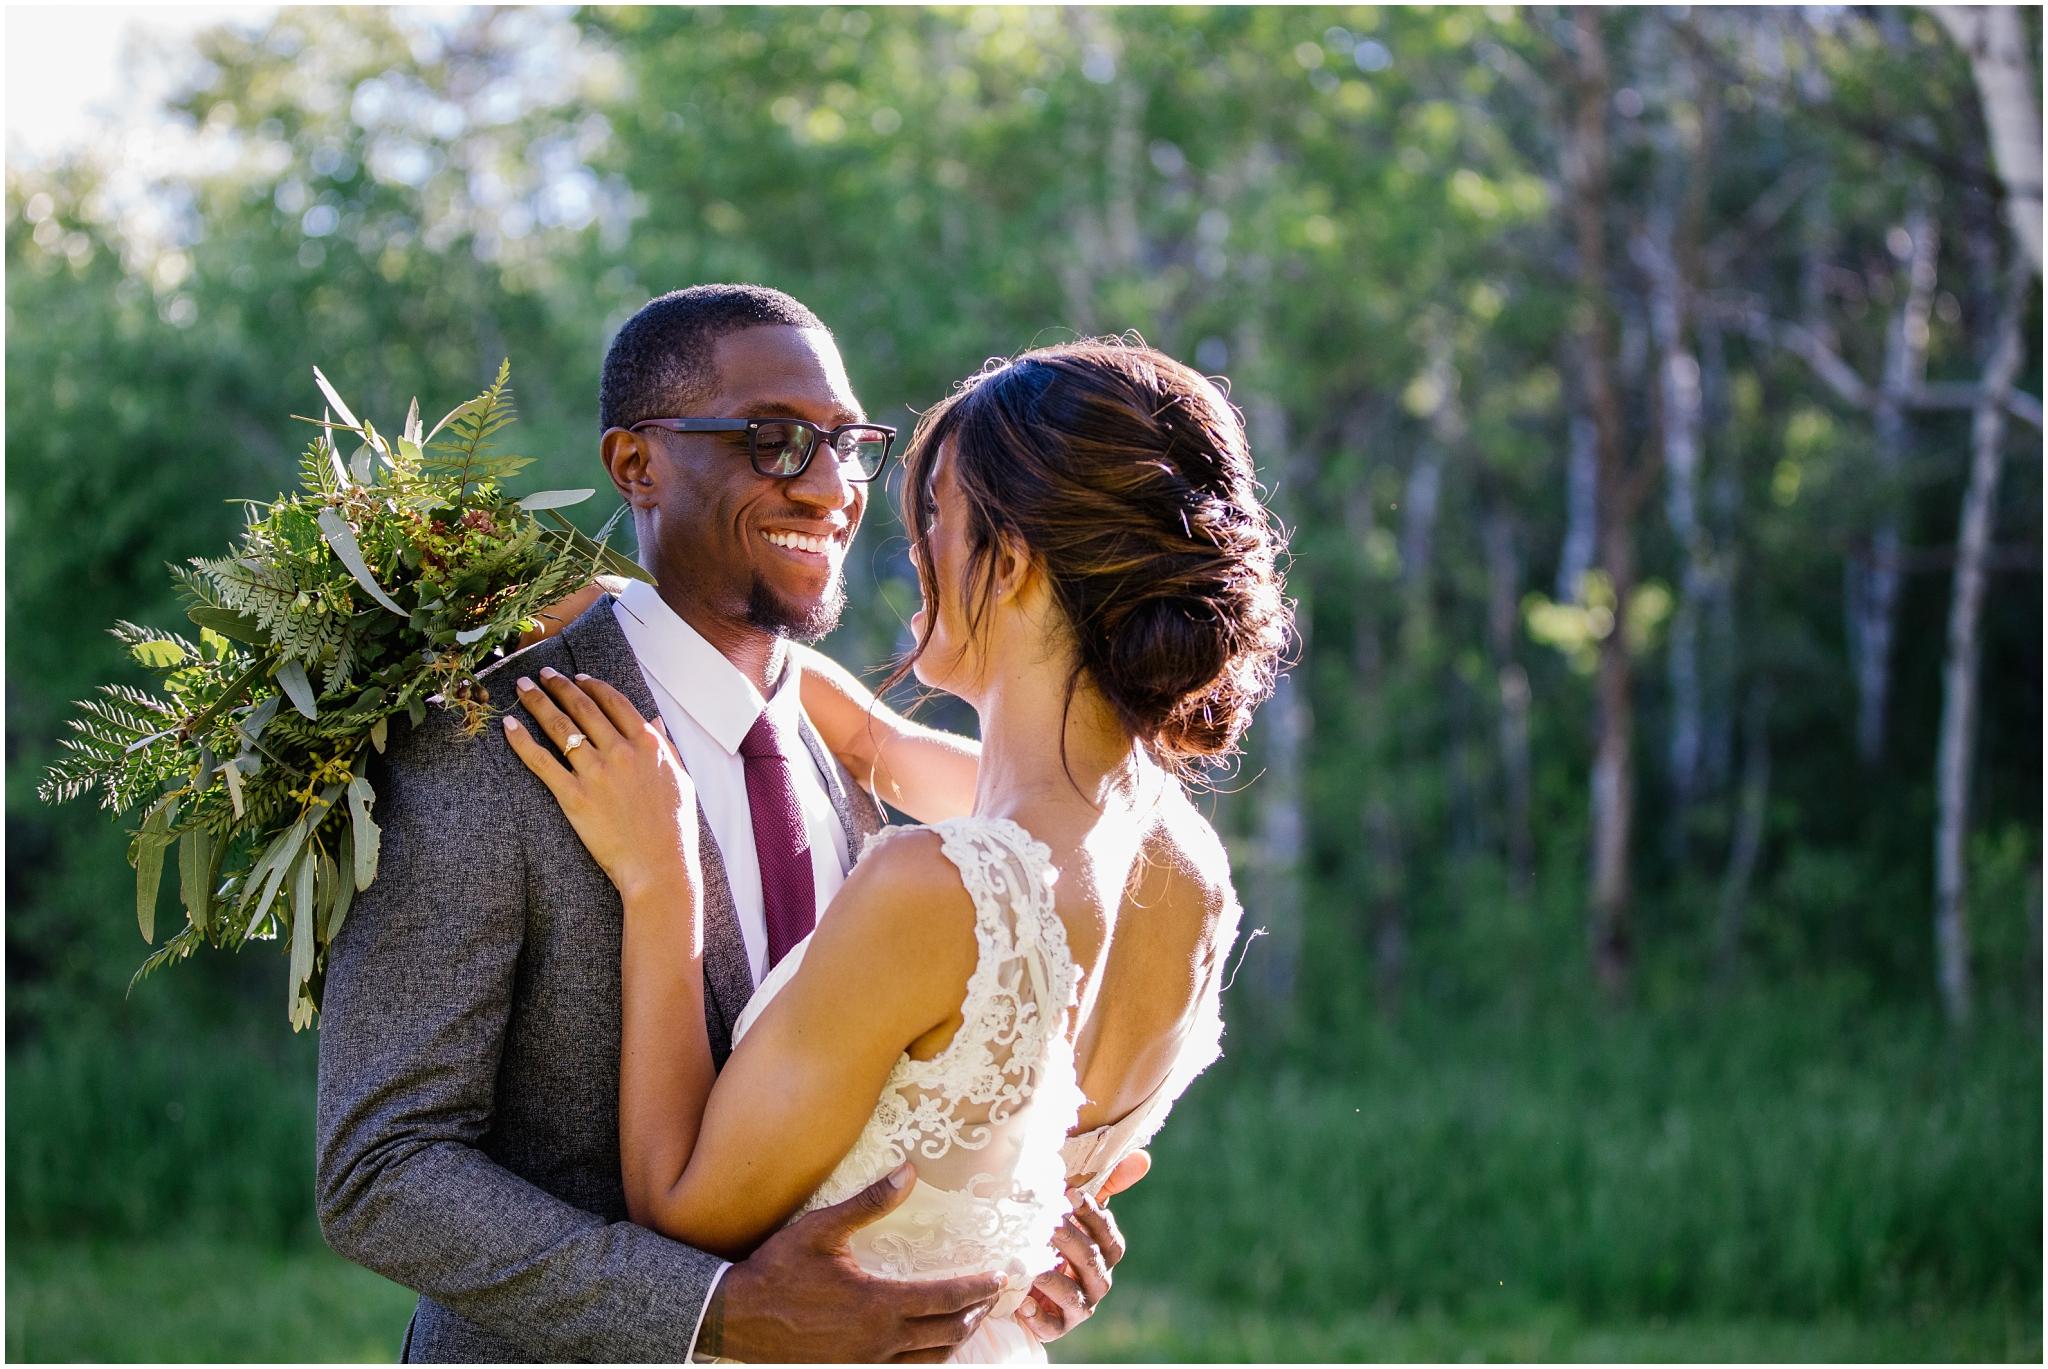 TreeHorseShoot-25_Lizzie-B-Imagery-Utah-Wedding-Photographer-Salt-Lake-City-Park-City-Oakley.jpg